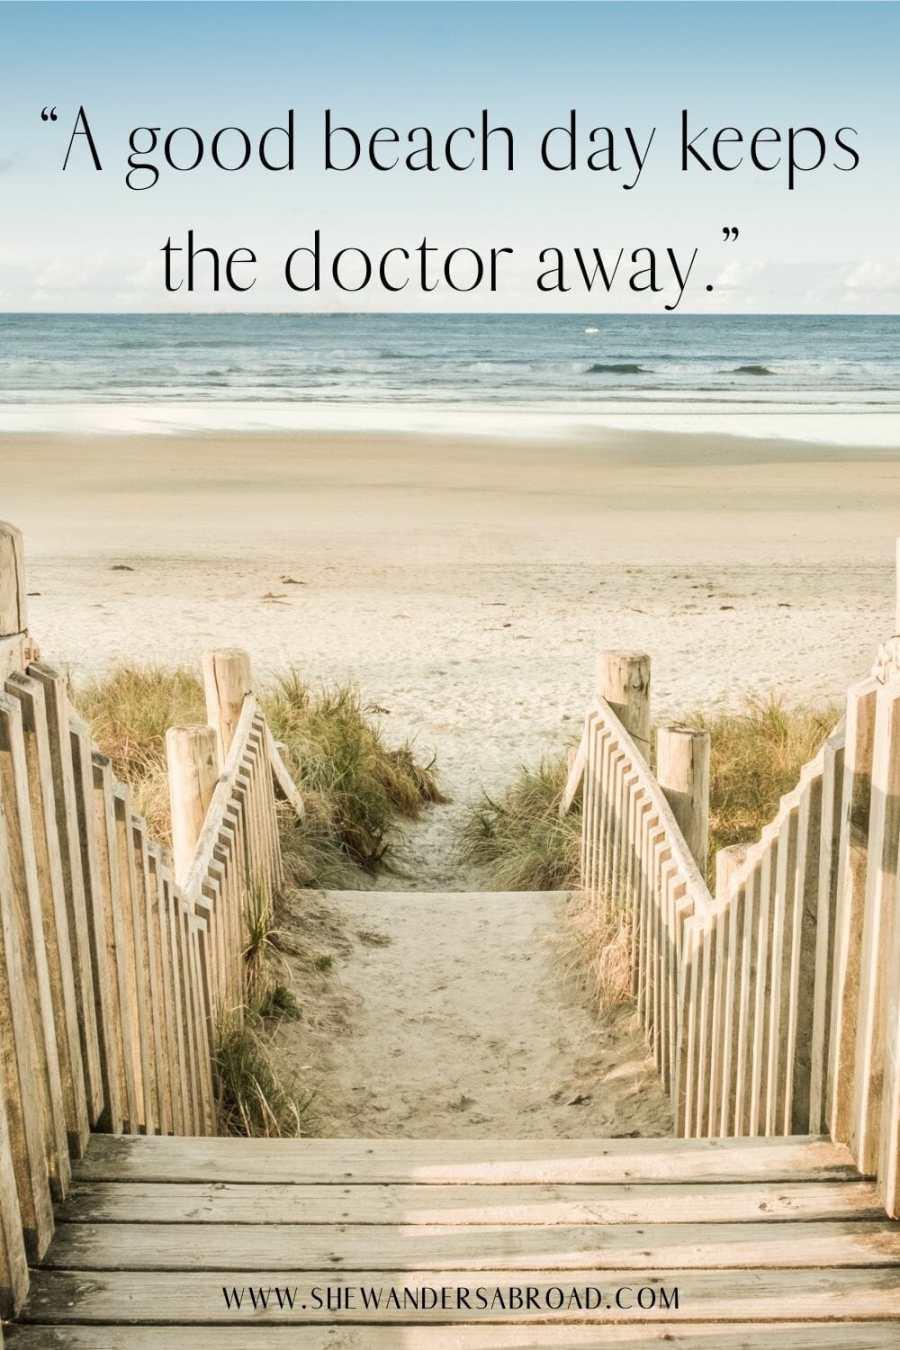 Cute beach captions for Instagram